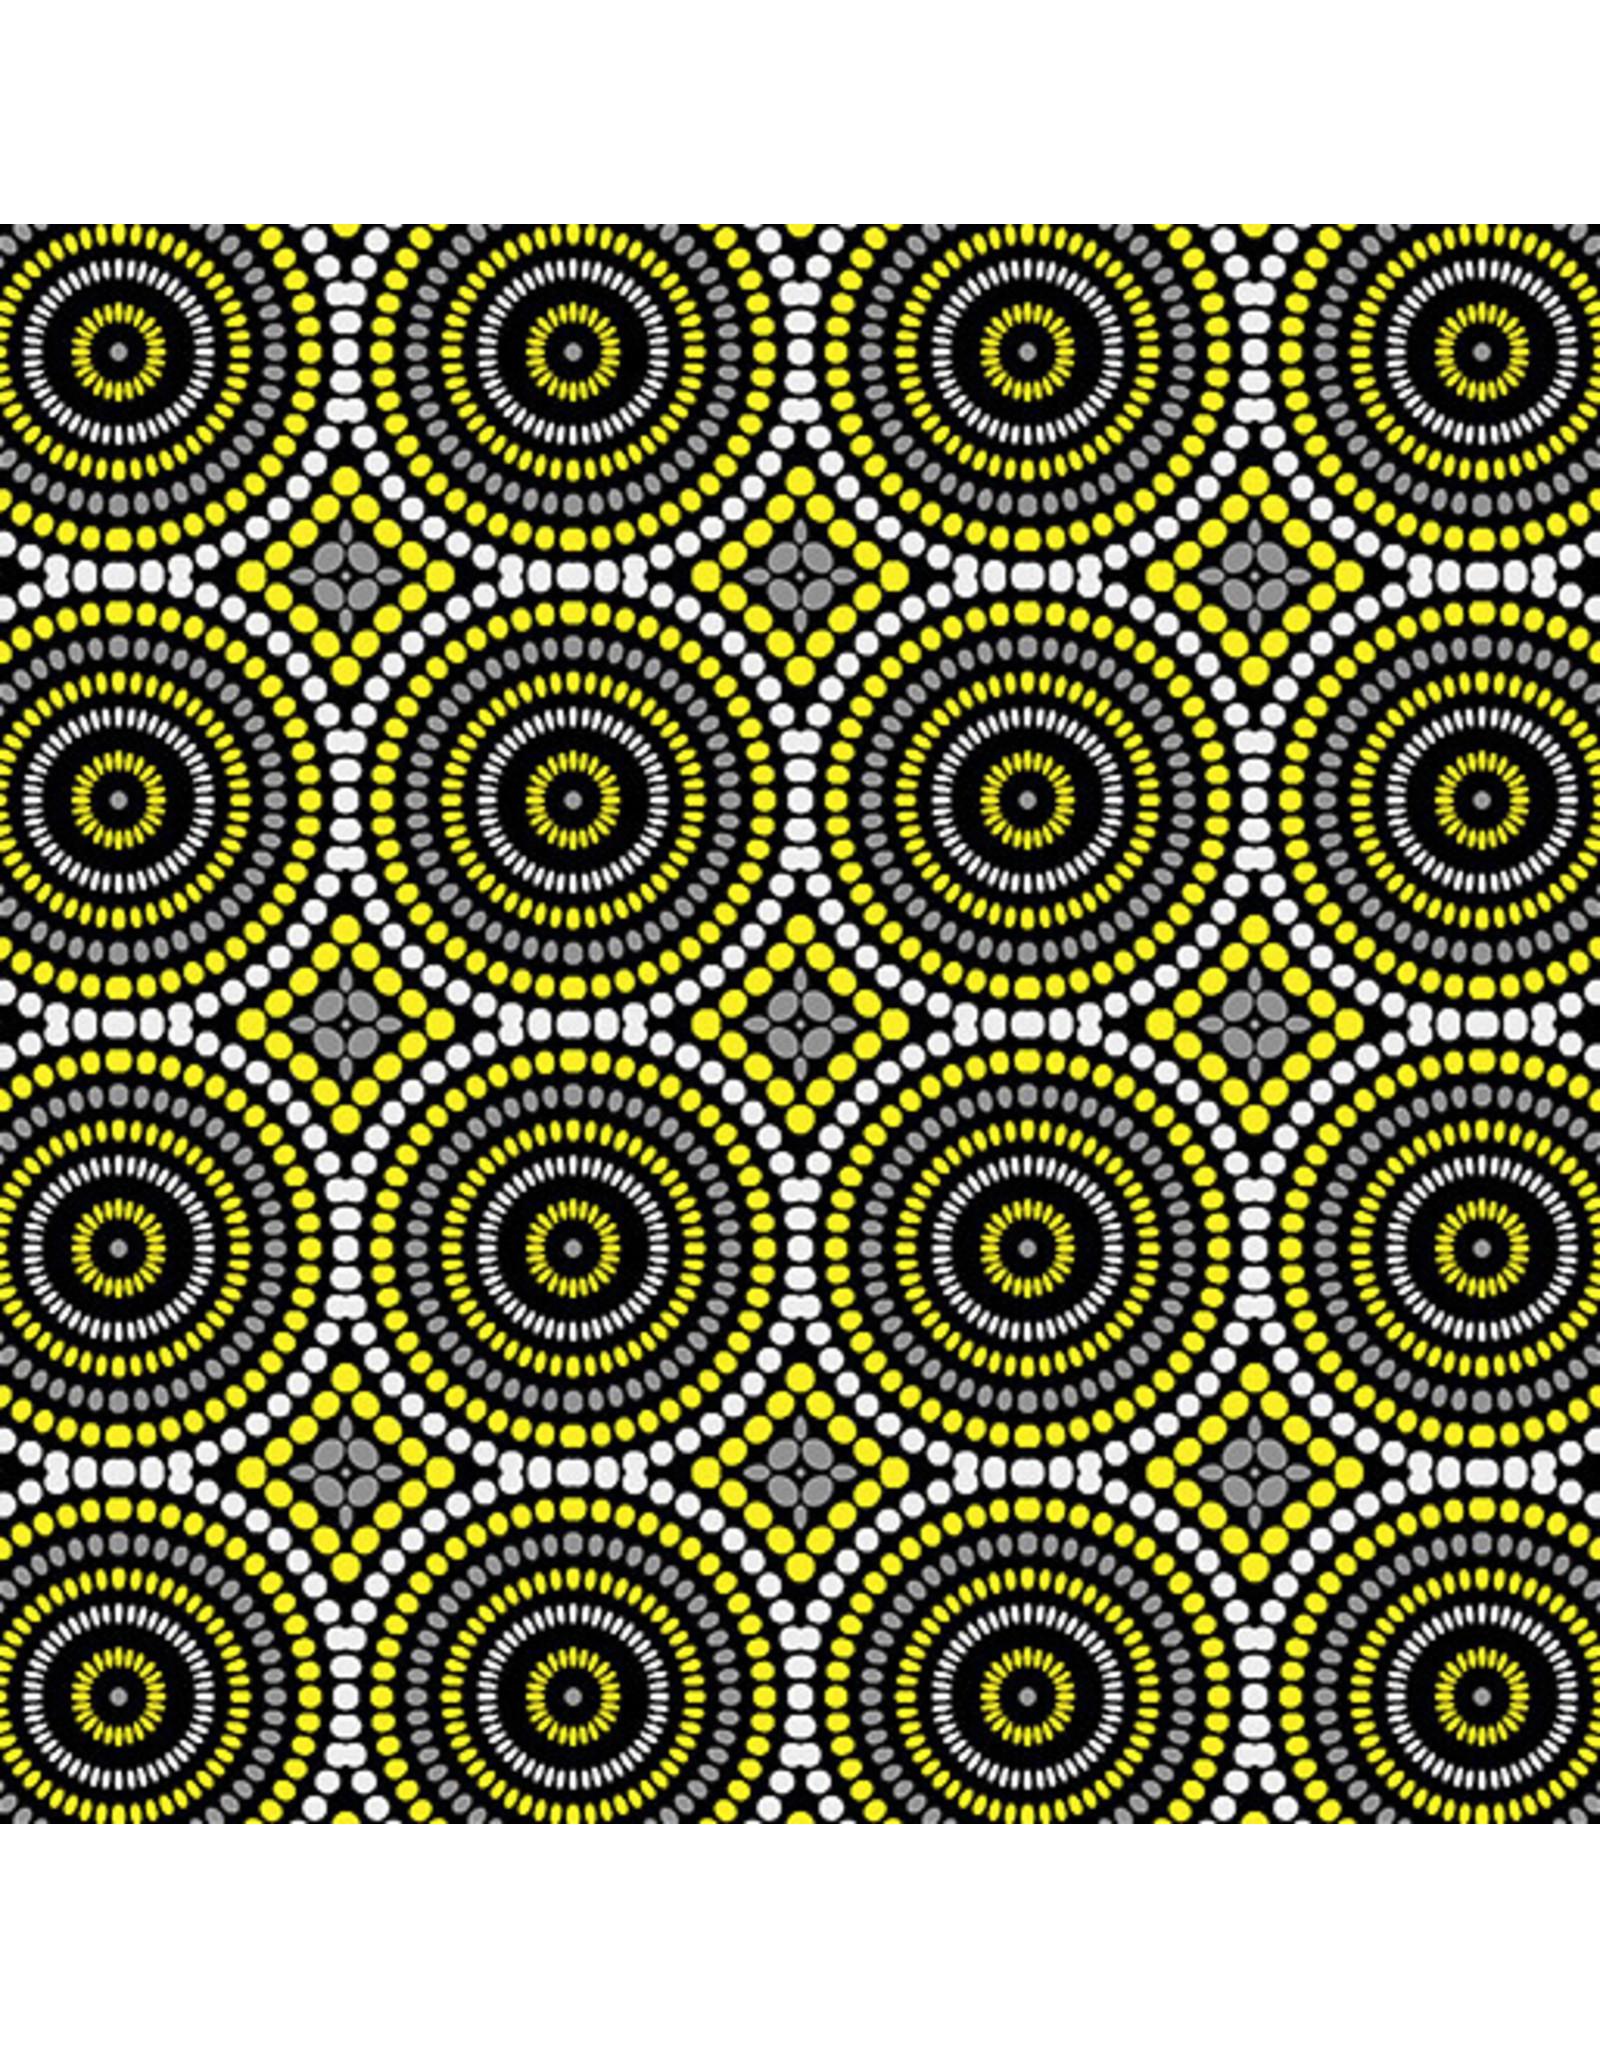 Contempo Geo Pop - Mosaic Dots Gray/Yellow